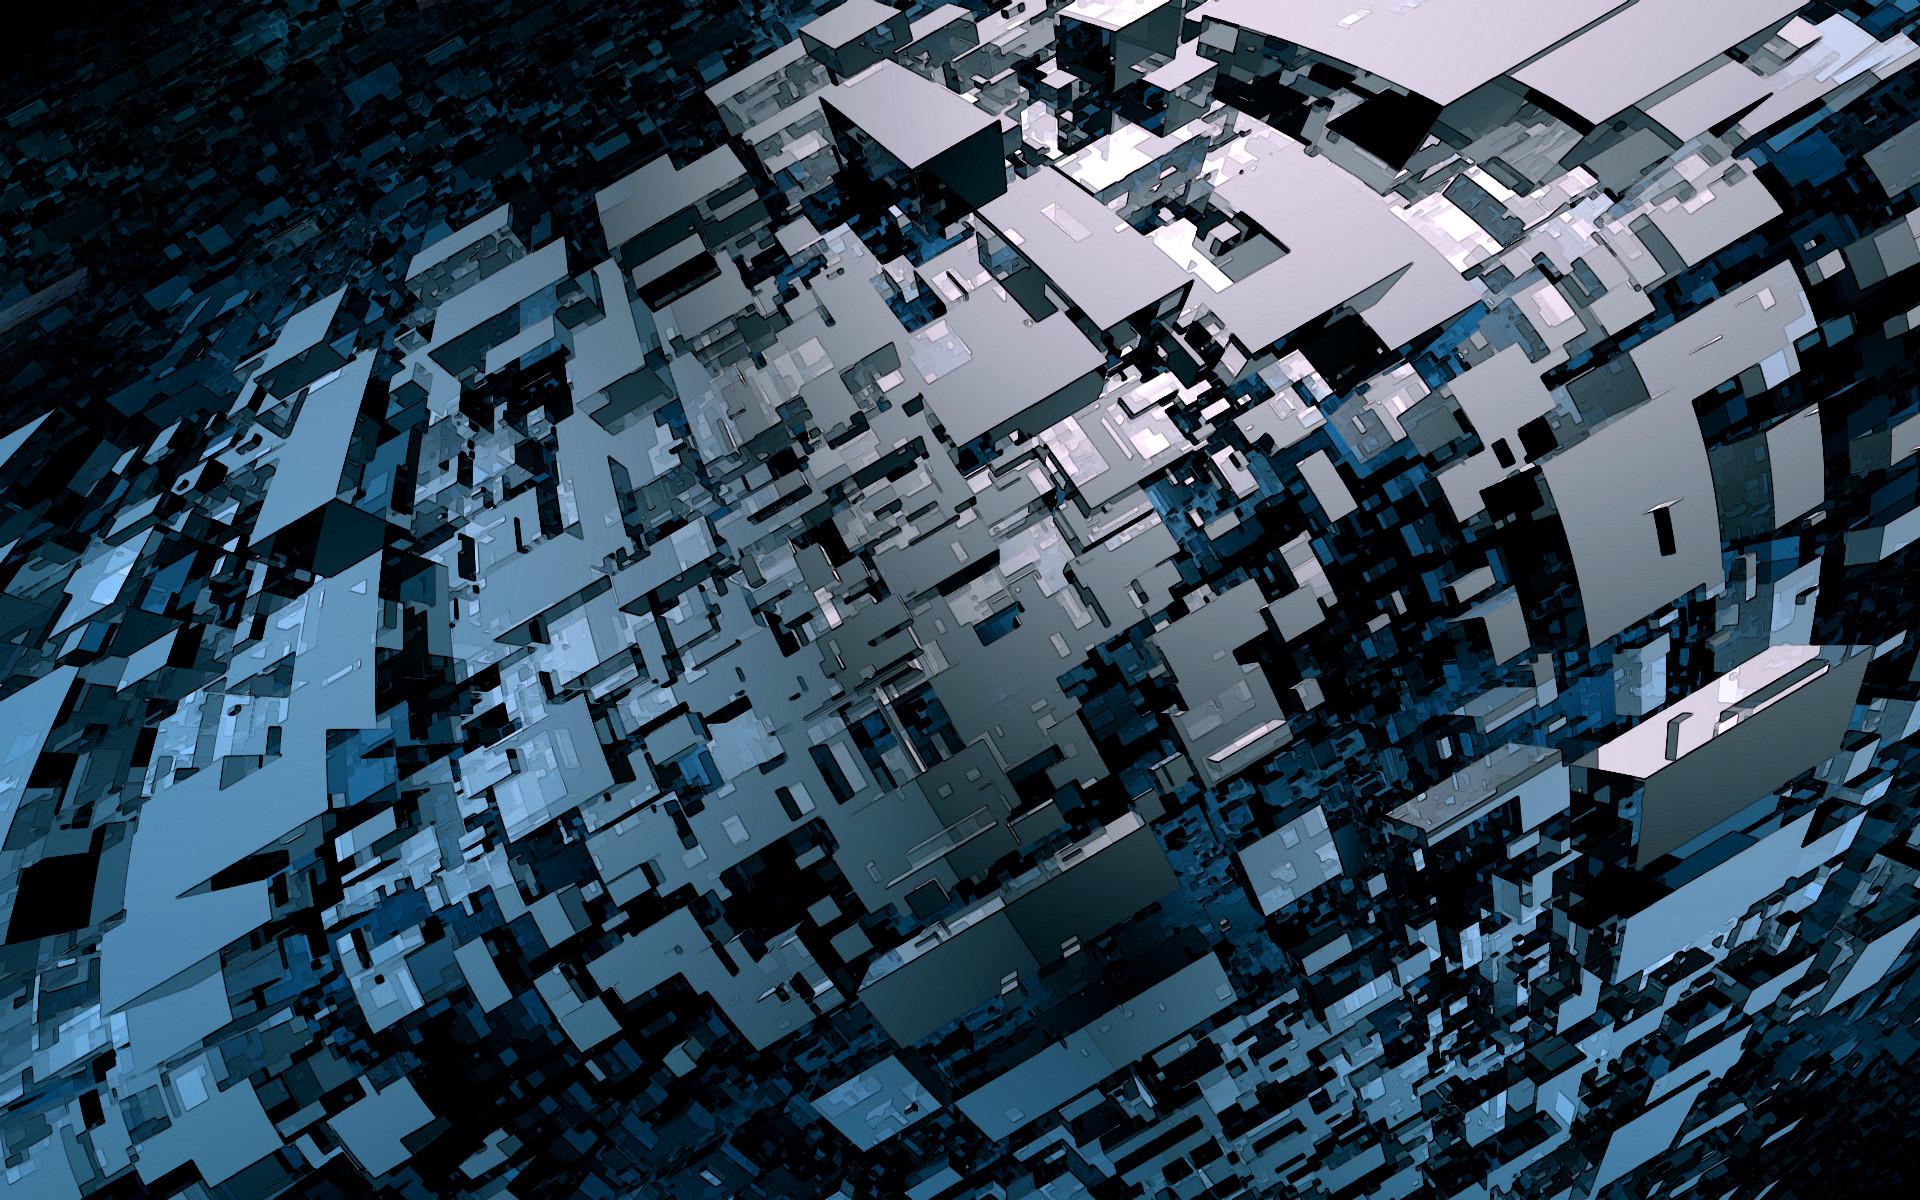 Joker Animated Wallpaper Background Nanotechnology Hd 183 ①